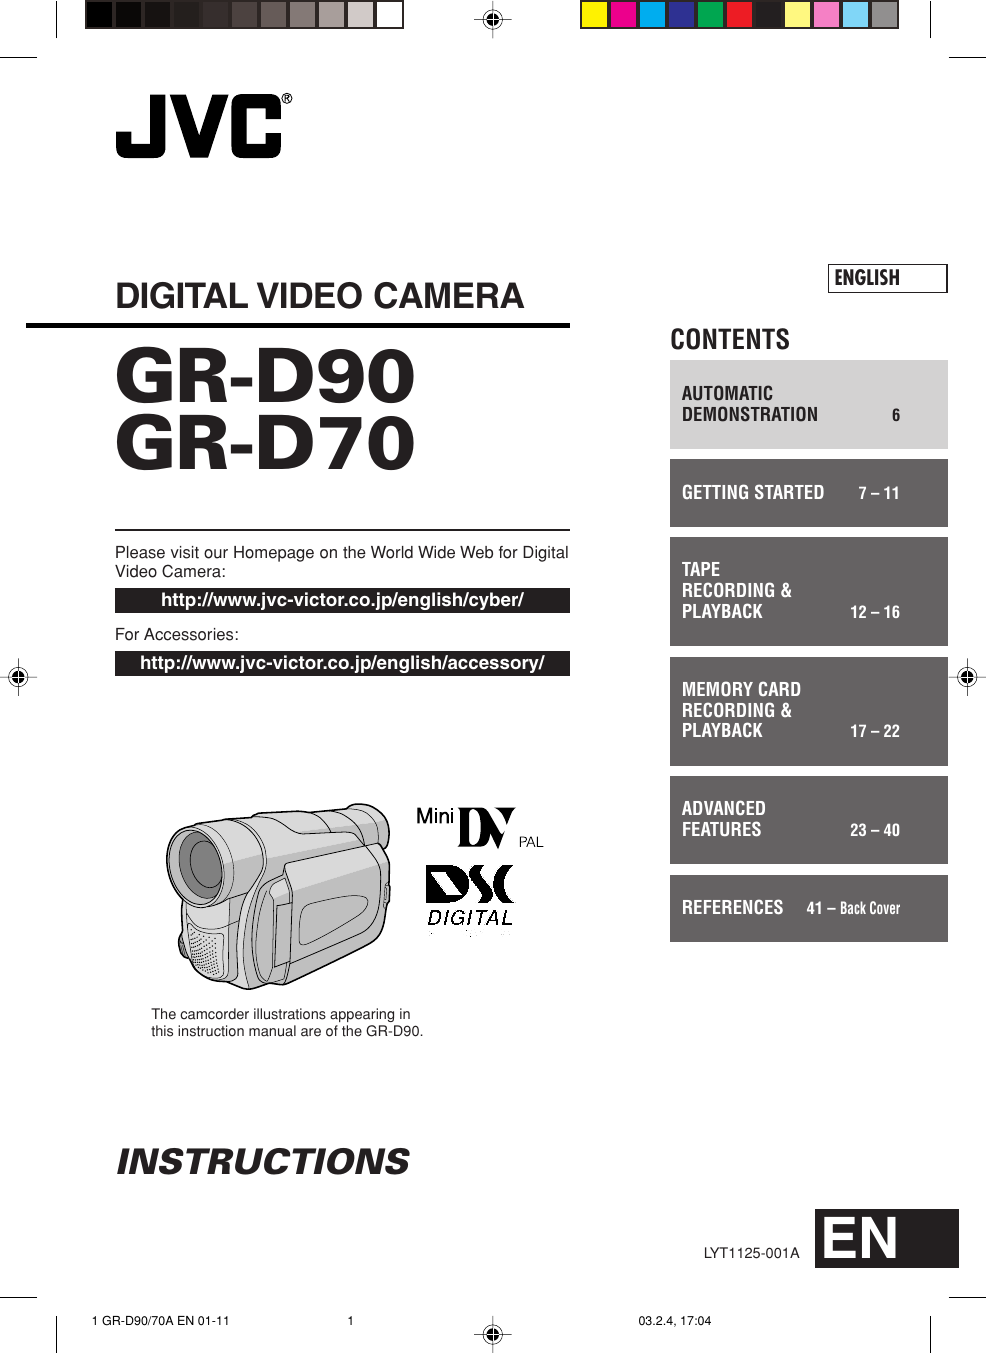 D90 Pocket Guide Ford Ecosport 2014 B515 Wiring Diagram Auto Repair Manual Forum Image Array Jvc Gr D70aa Ag As Ah User Lyt1125 001a Rh Usermanual